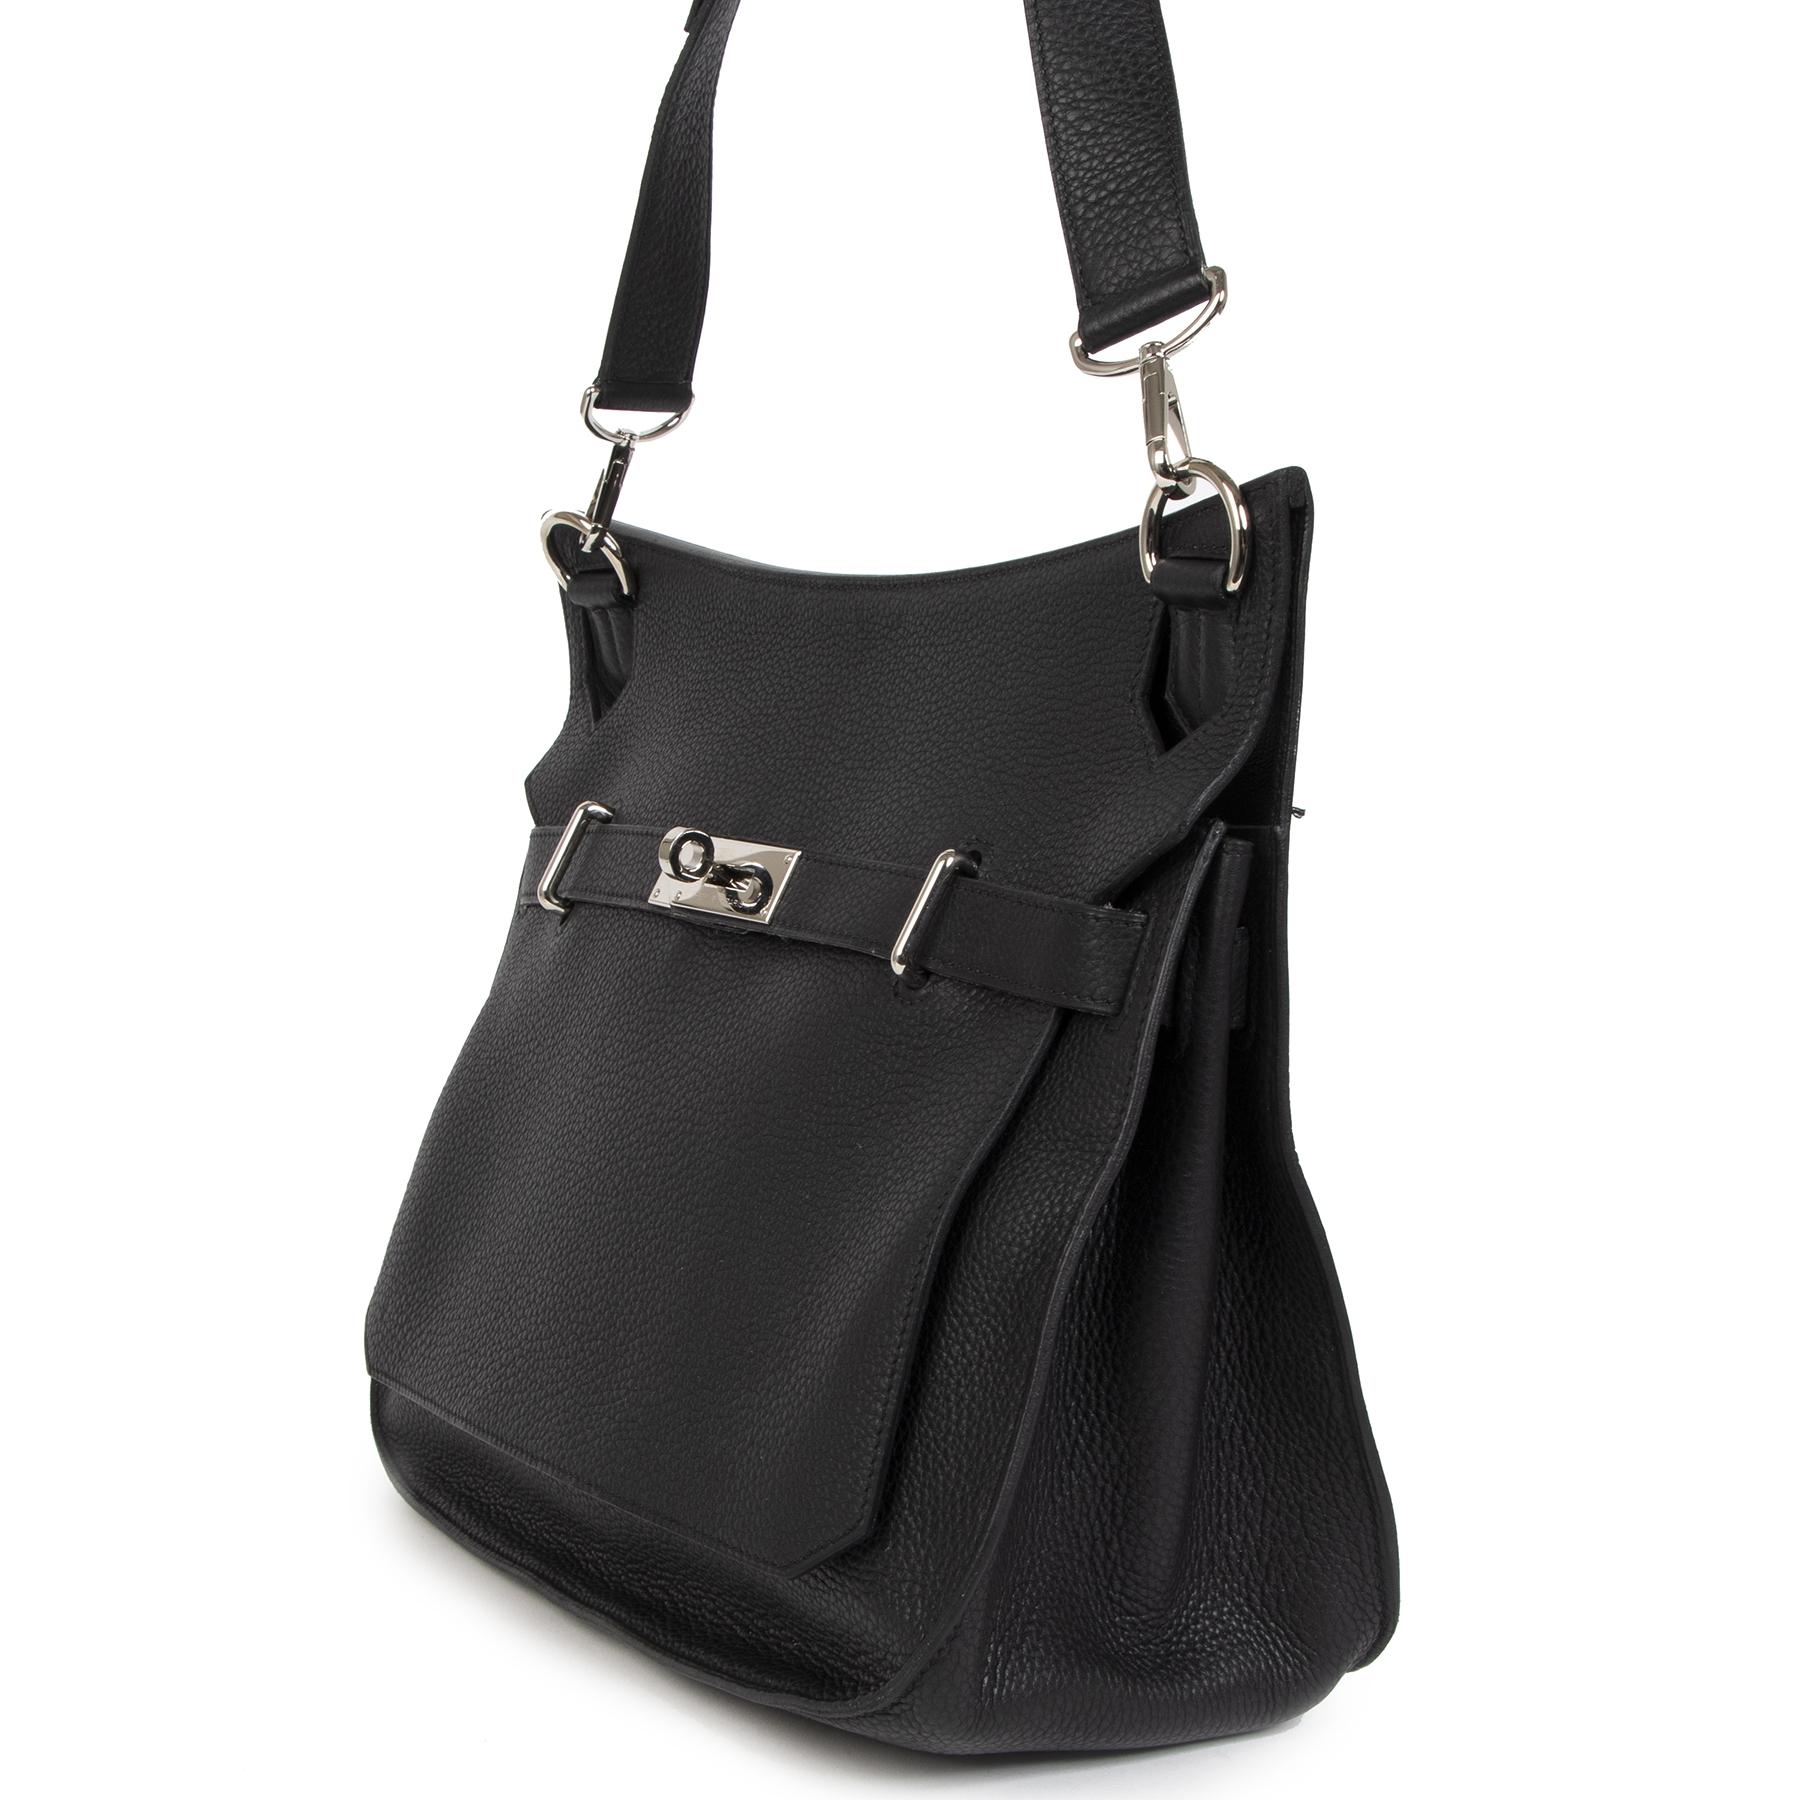 Authentic second-hand vintage Hermès Jypsiere 34 Shoulder Bag buy online webshop LabelLOV